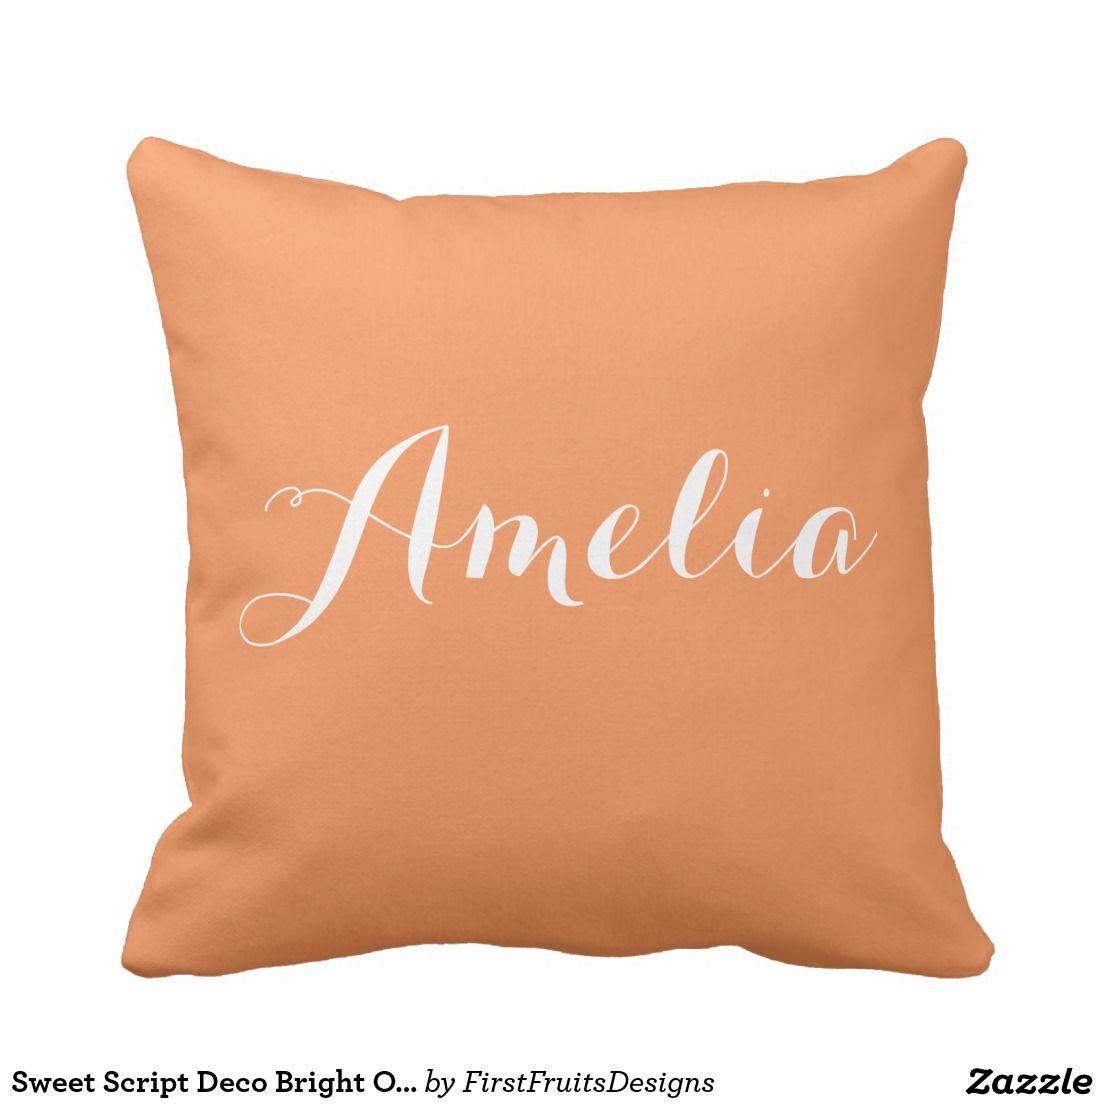 Sweet script deco bright orange white monogram pillow looking for